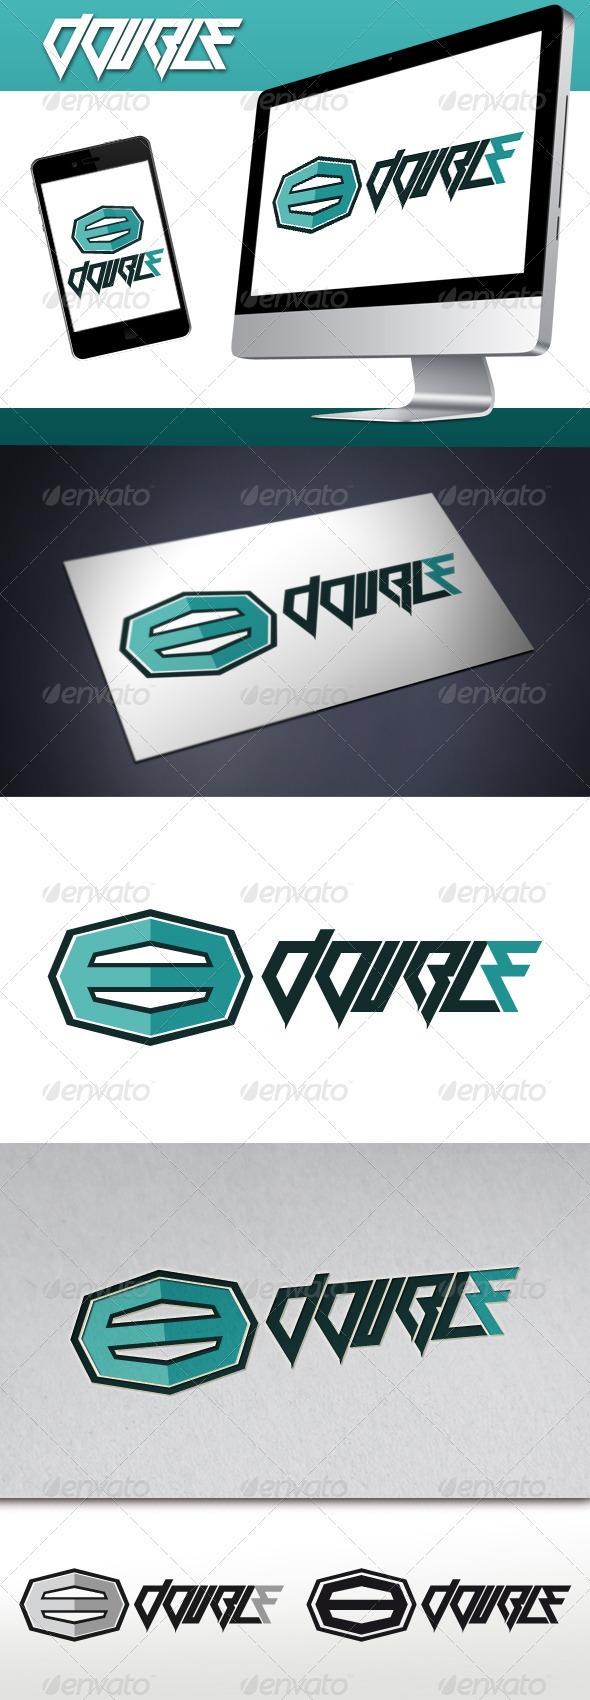 Letter E Logo (Double E)